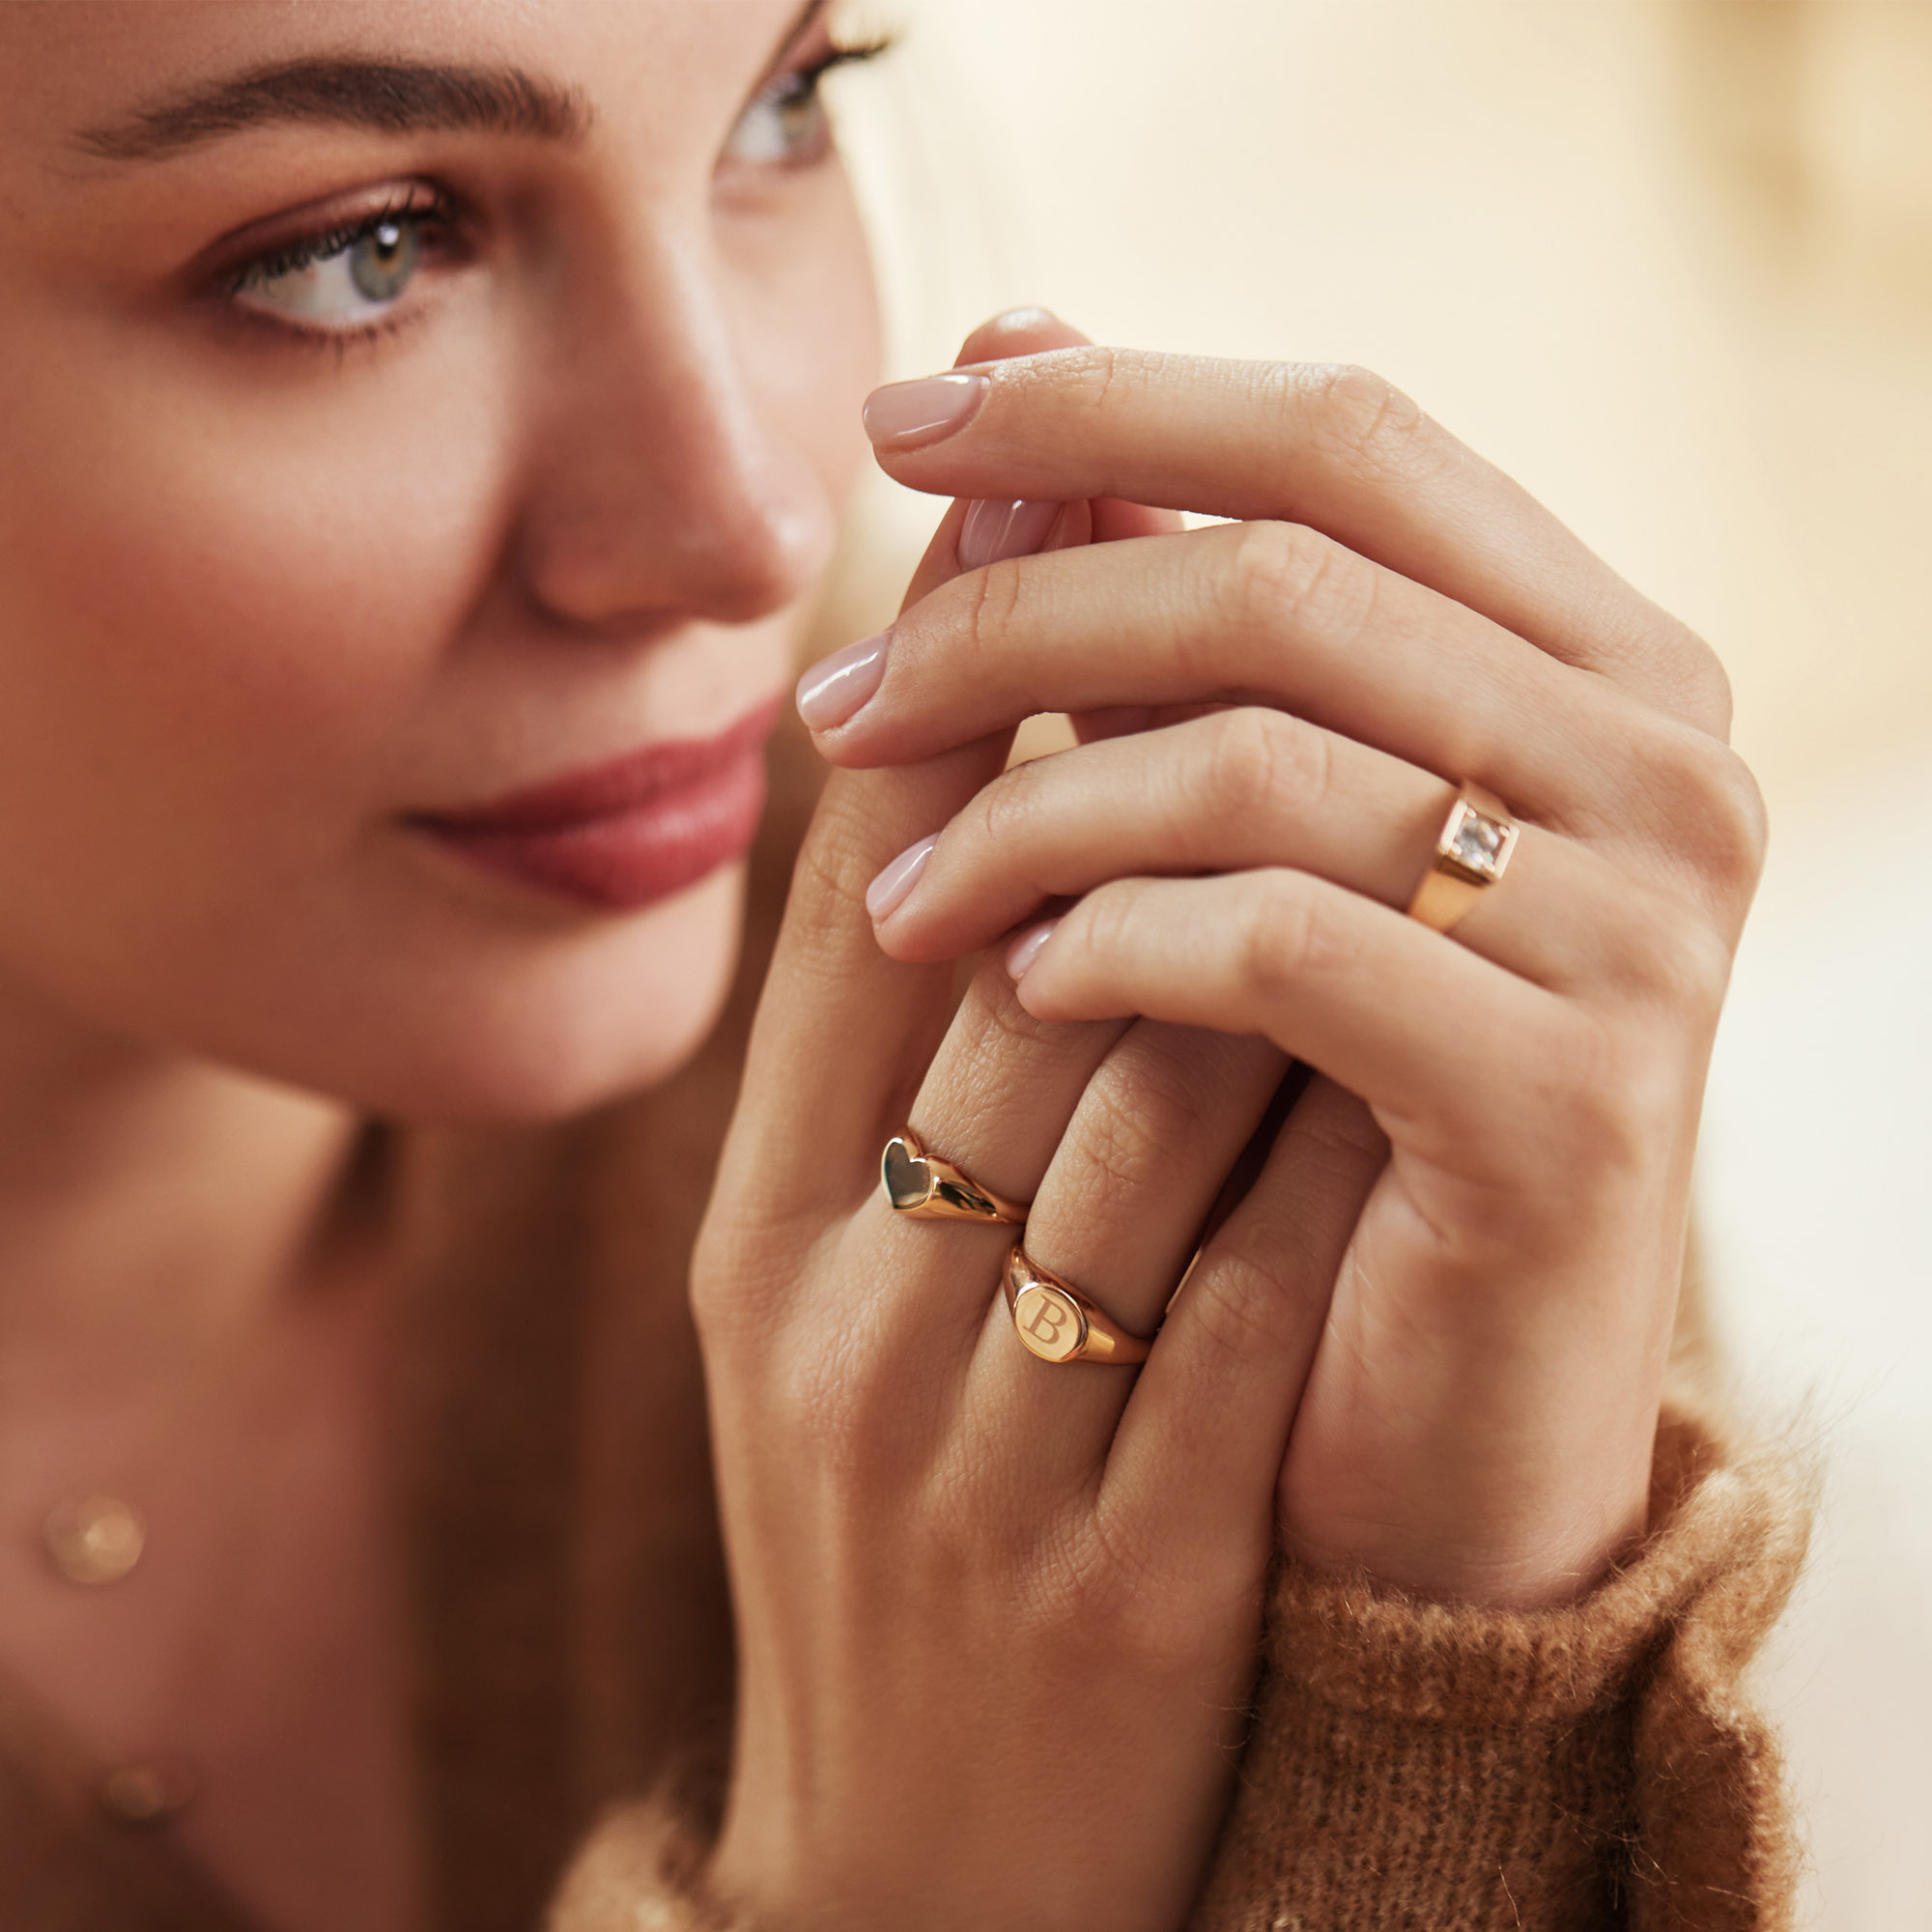 Isabel Bernard La Concorde Lauren 14 karat rose guld initial signet ring (58)